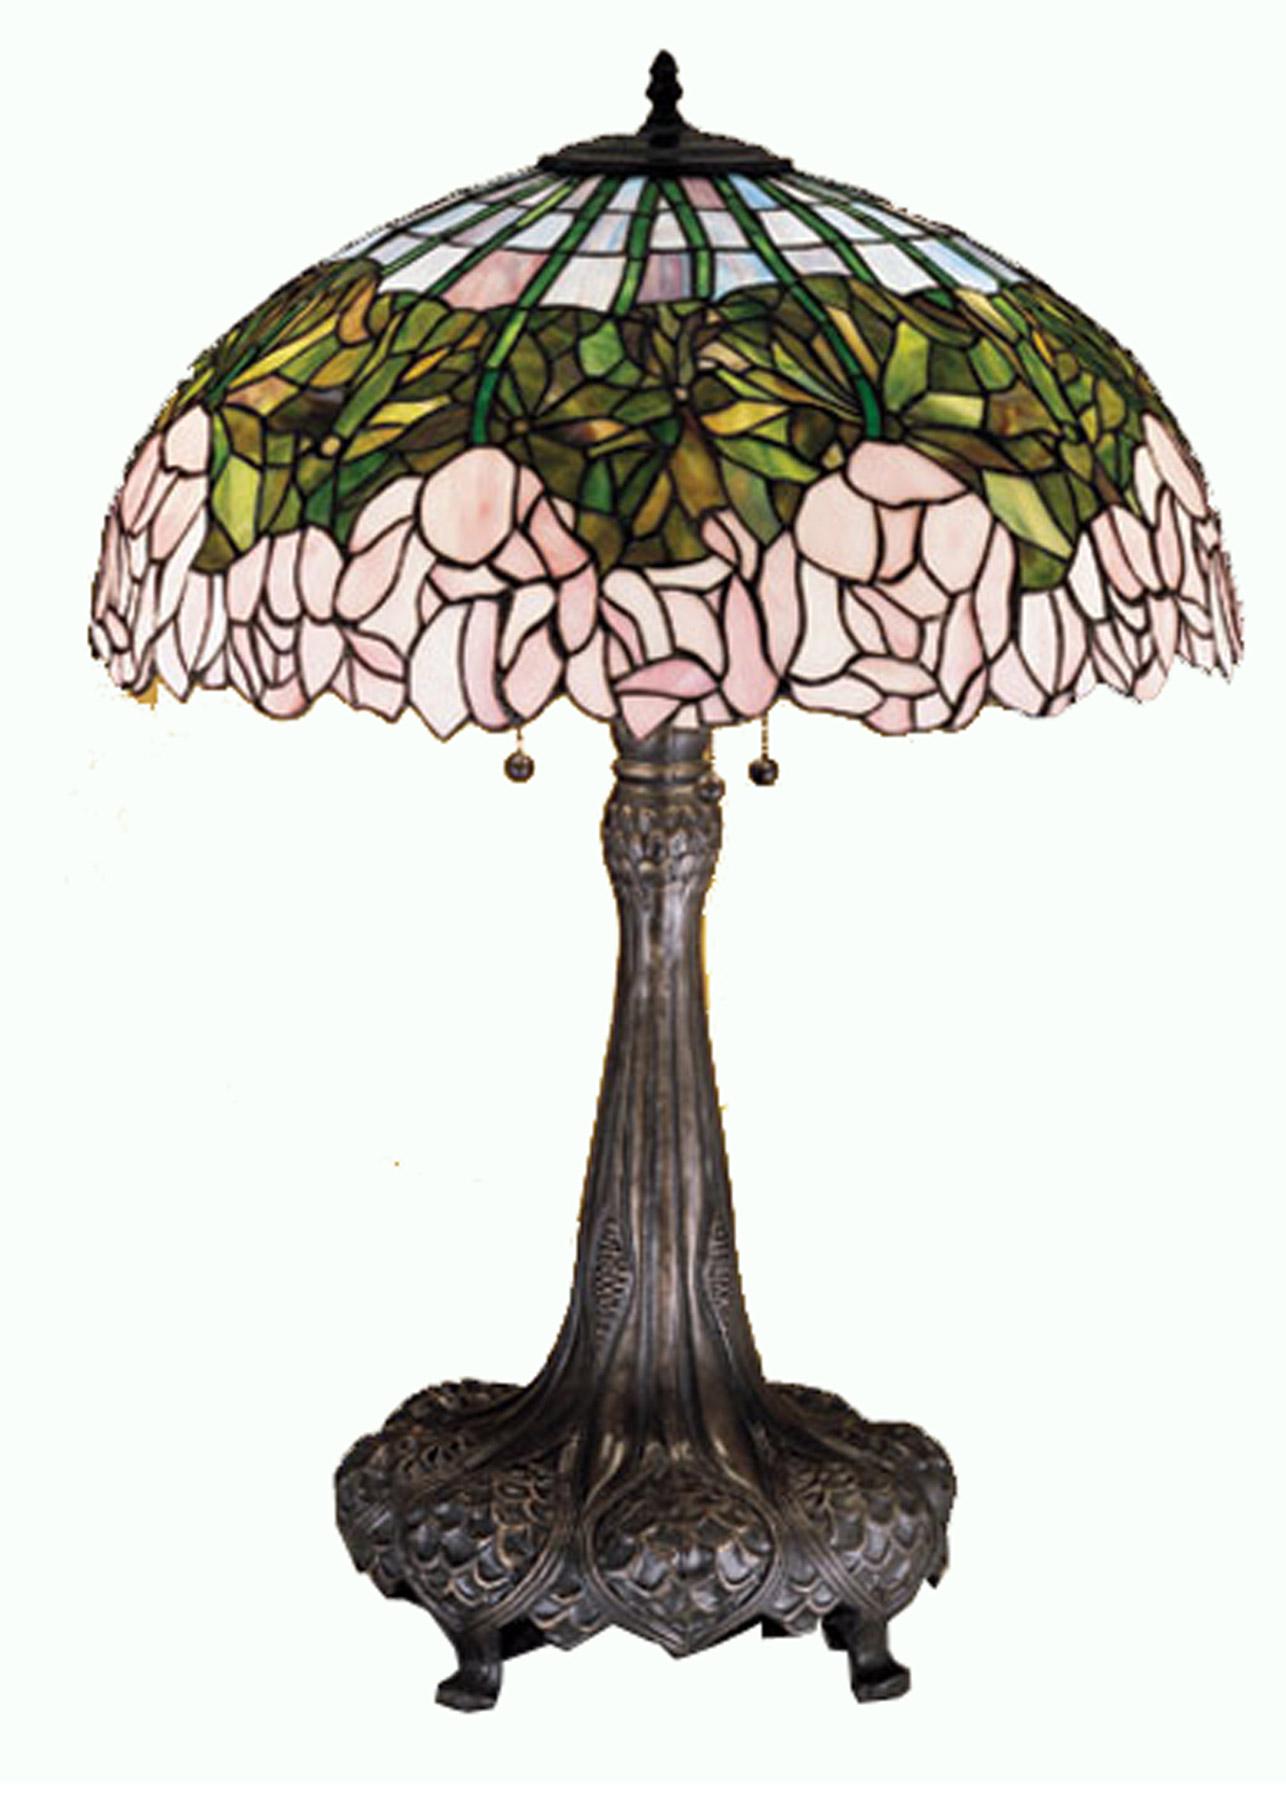 Meyda 30513 Tiffany Cabbage Rose Large Table Lamp